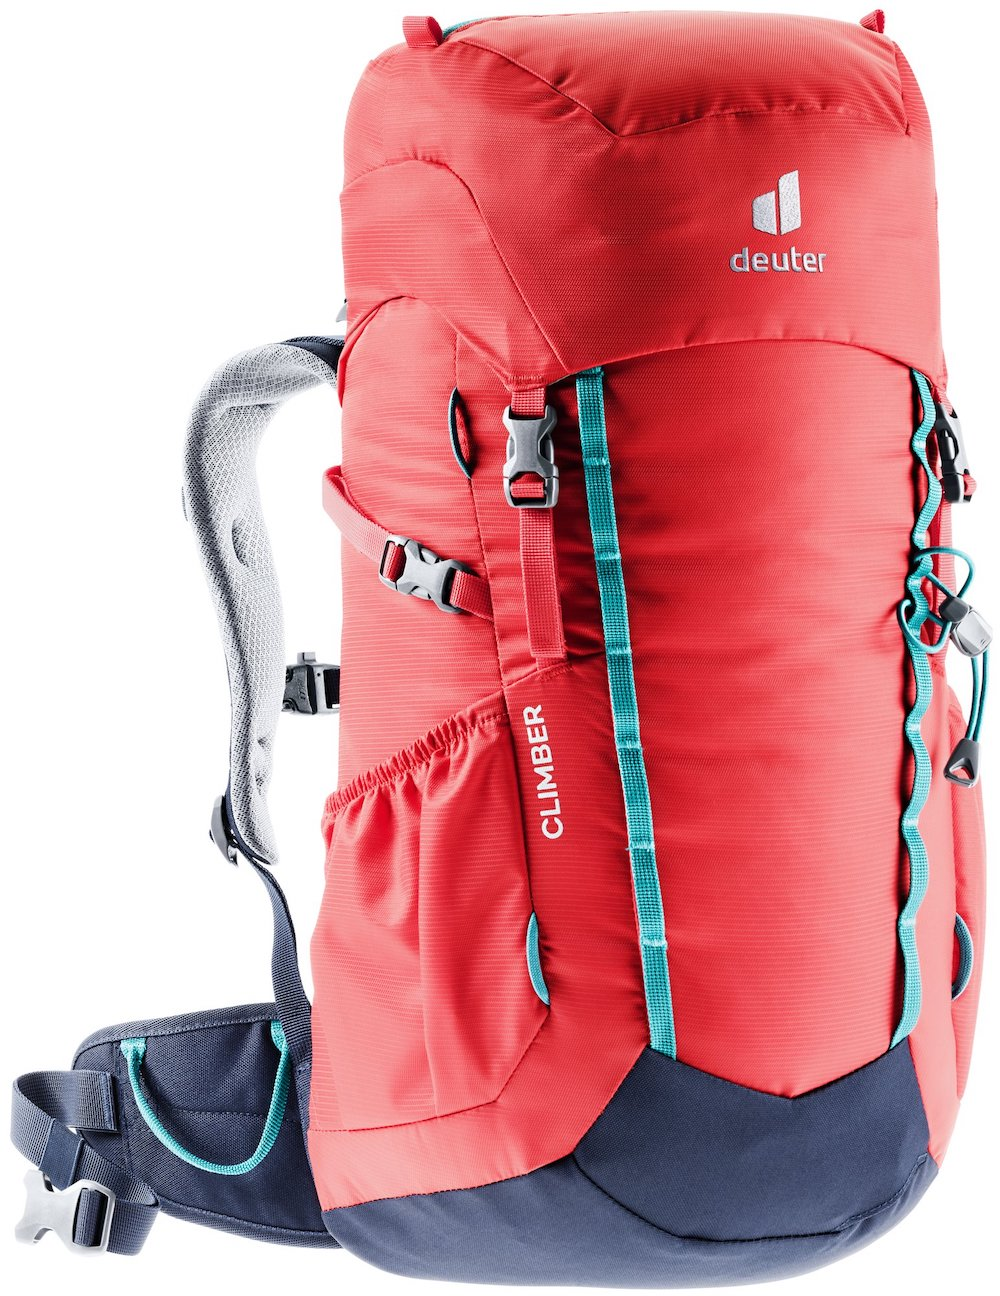 Deuter - Climber, Kinderrucksack